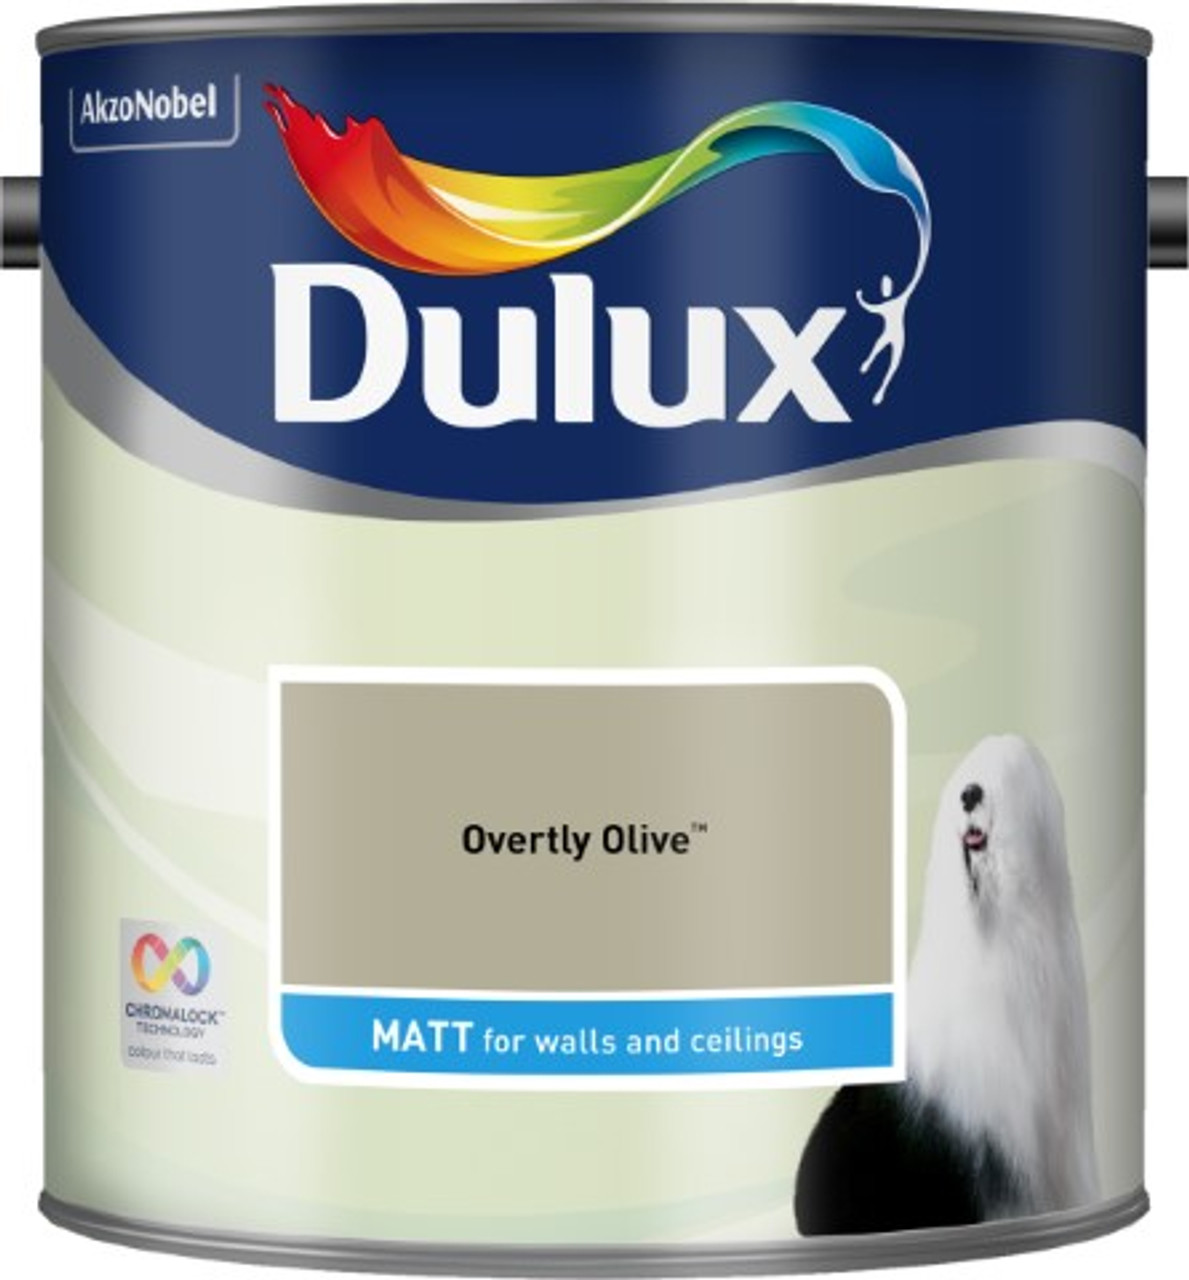 2.5L Dulux Matt Emulsion Overtly Olive